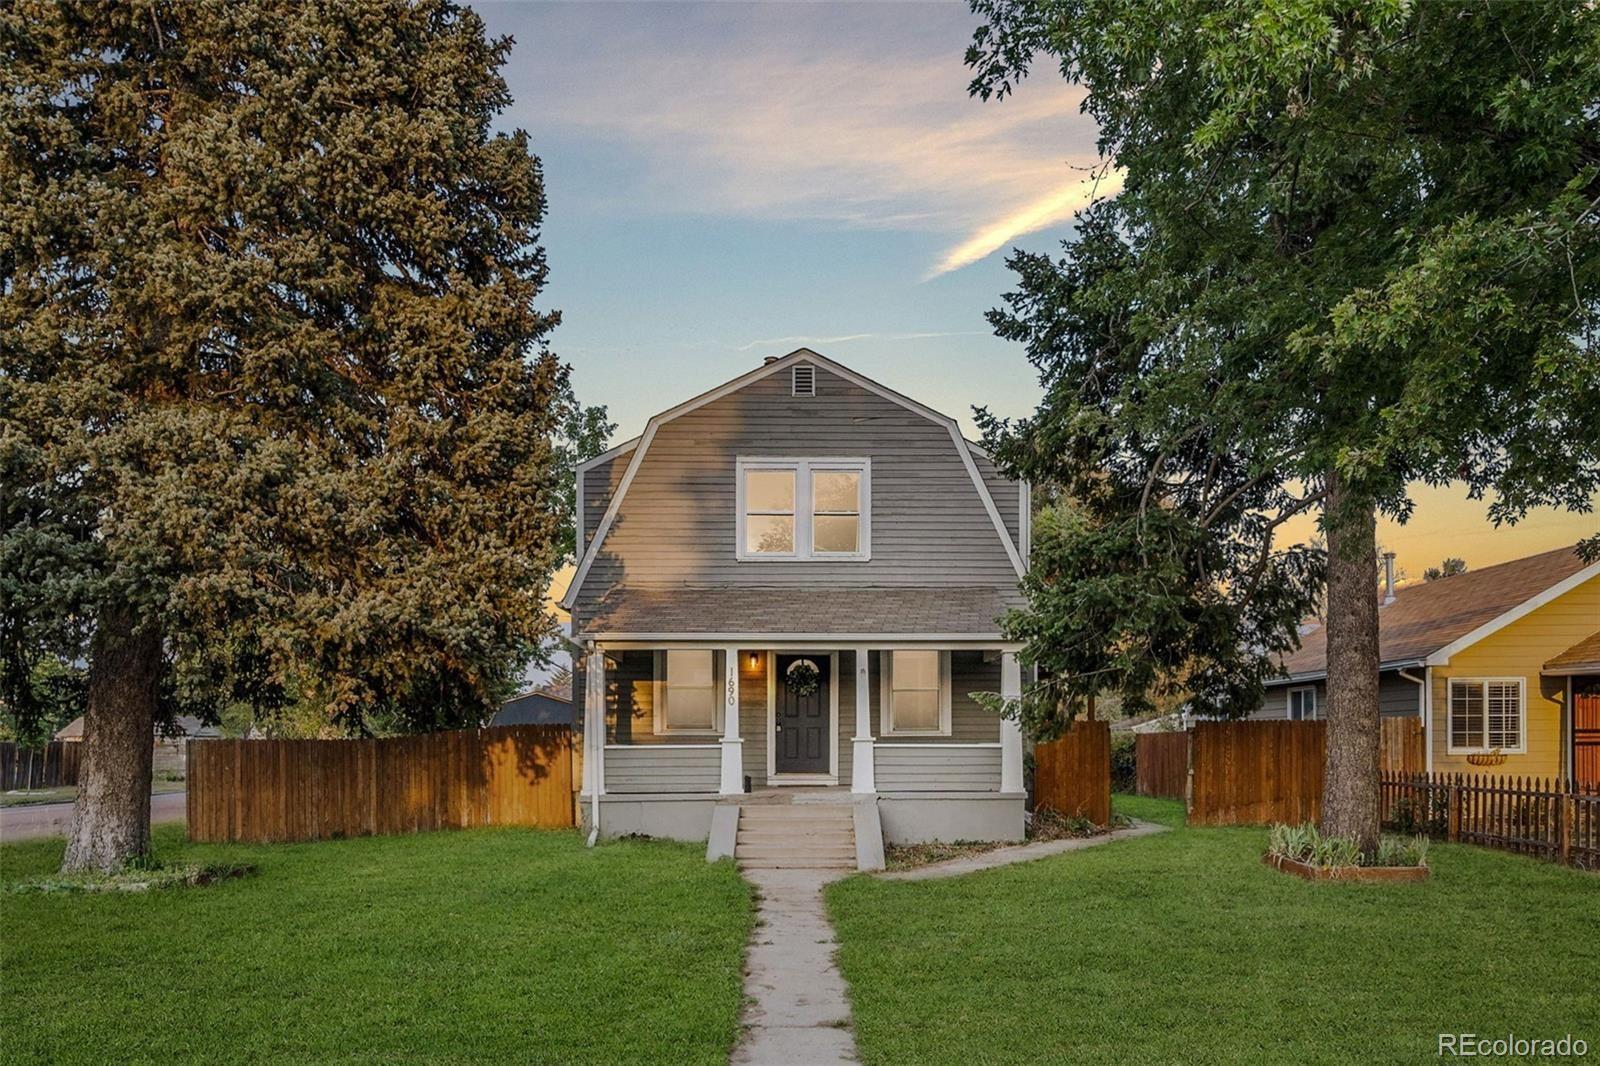 Photo of 1690 Spruce Street, Denver, CO 80220 (MLS # 9306771)